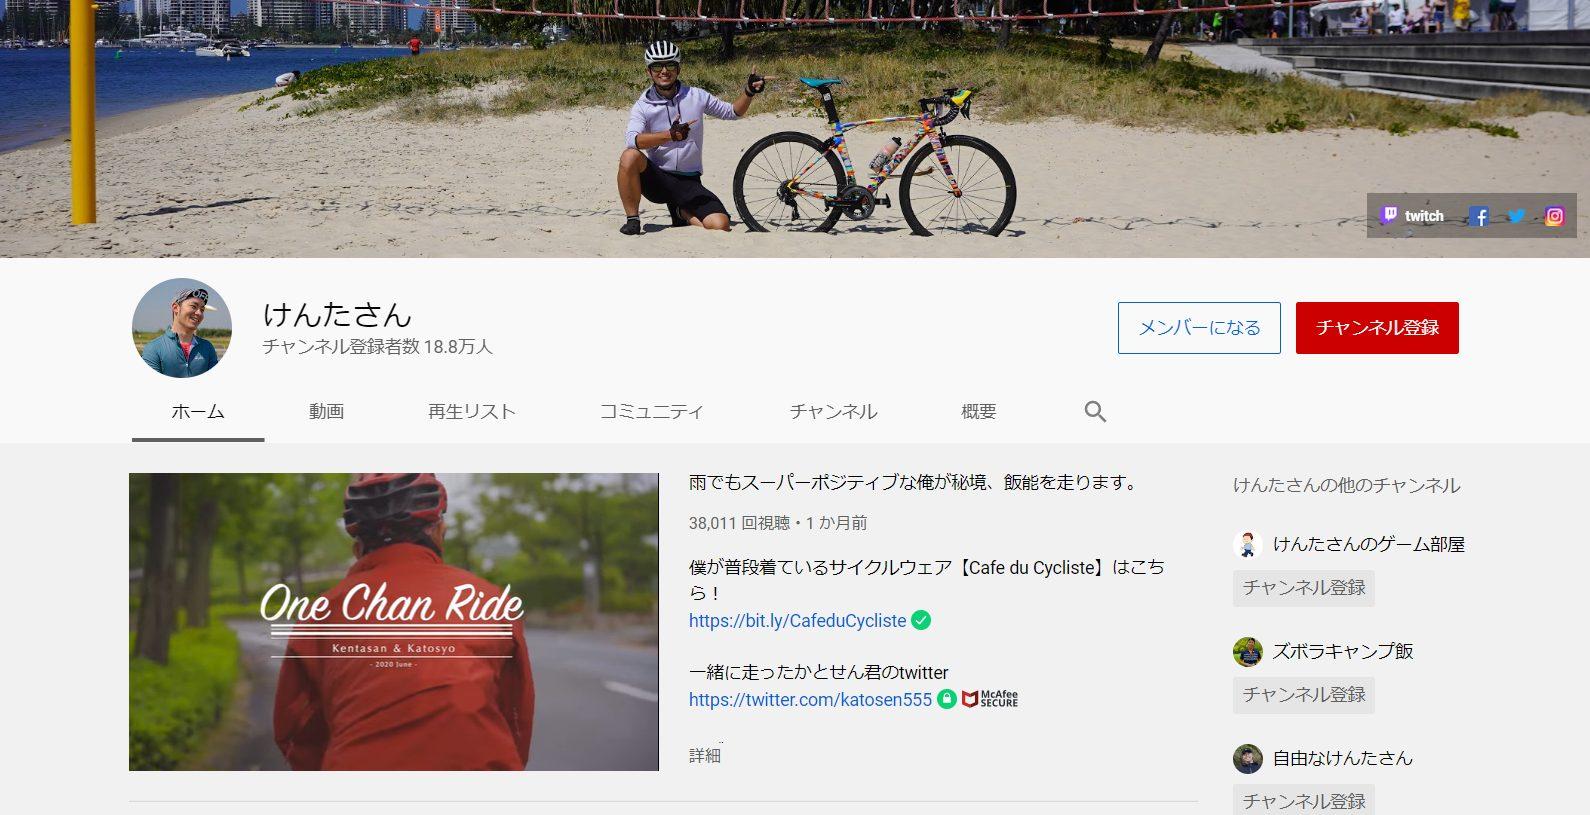 youtube-sports-influencer-kentasan